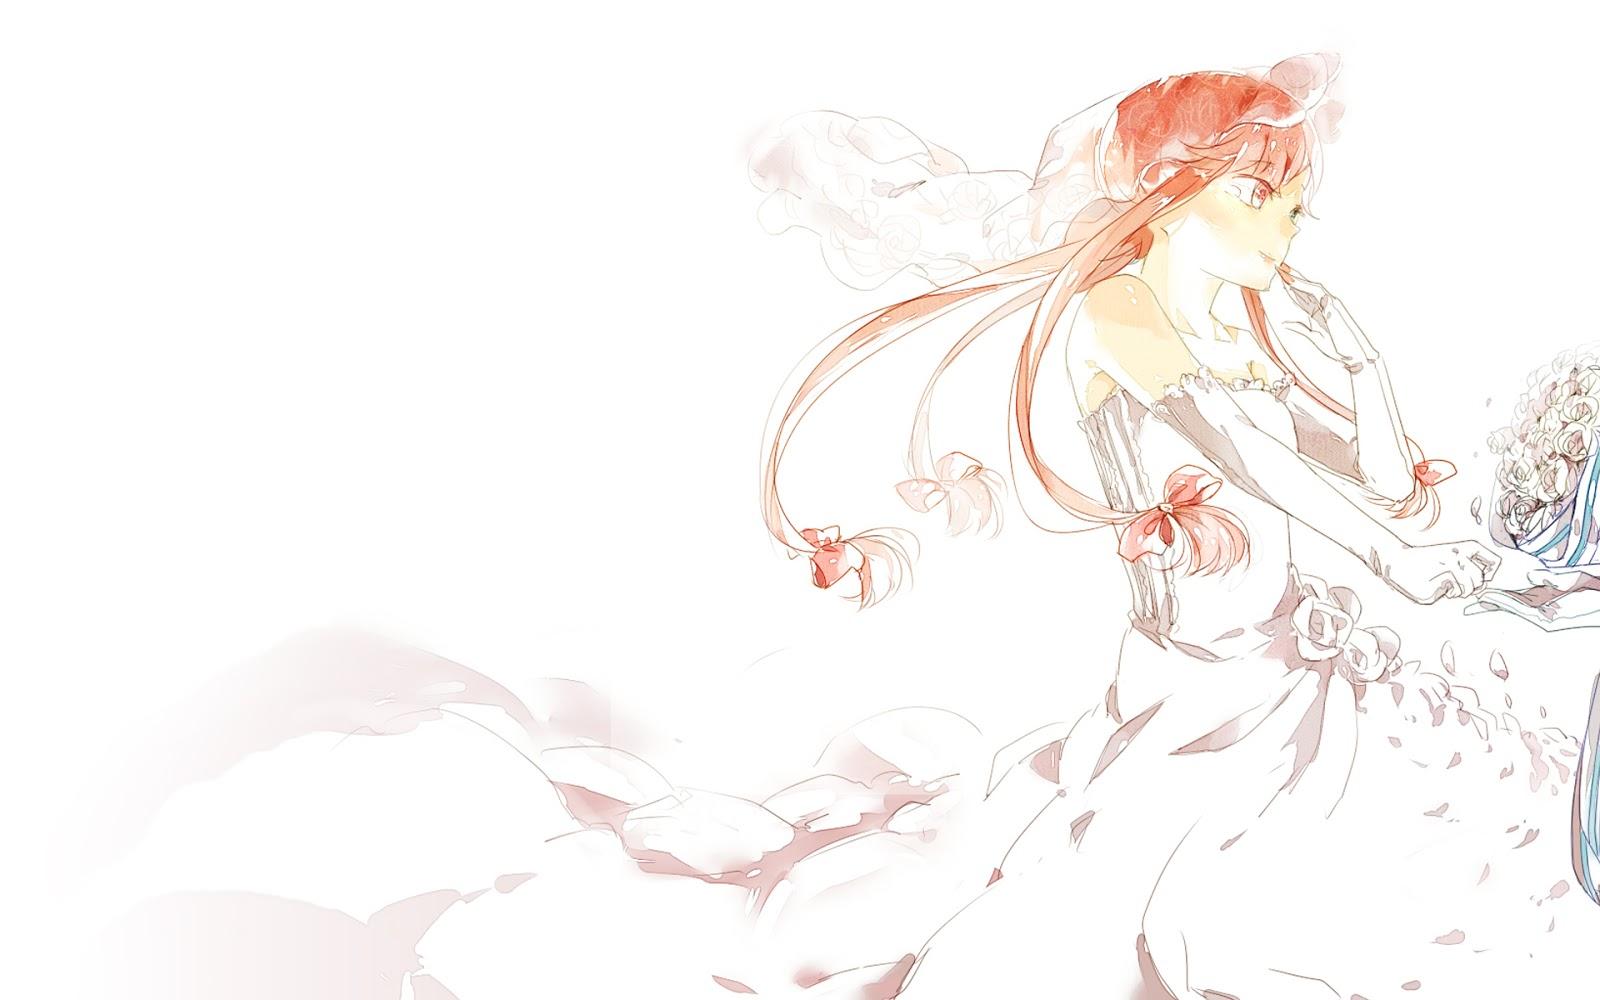 Gasai yuno iphone wallpaper tumblr - Yuno Gasai Future Diary Anime Girl Flowers Wedding Dress Hd Wallpaper